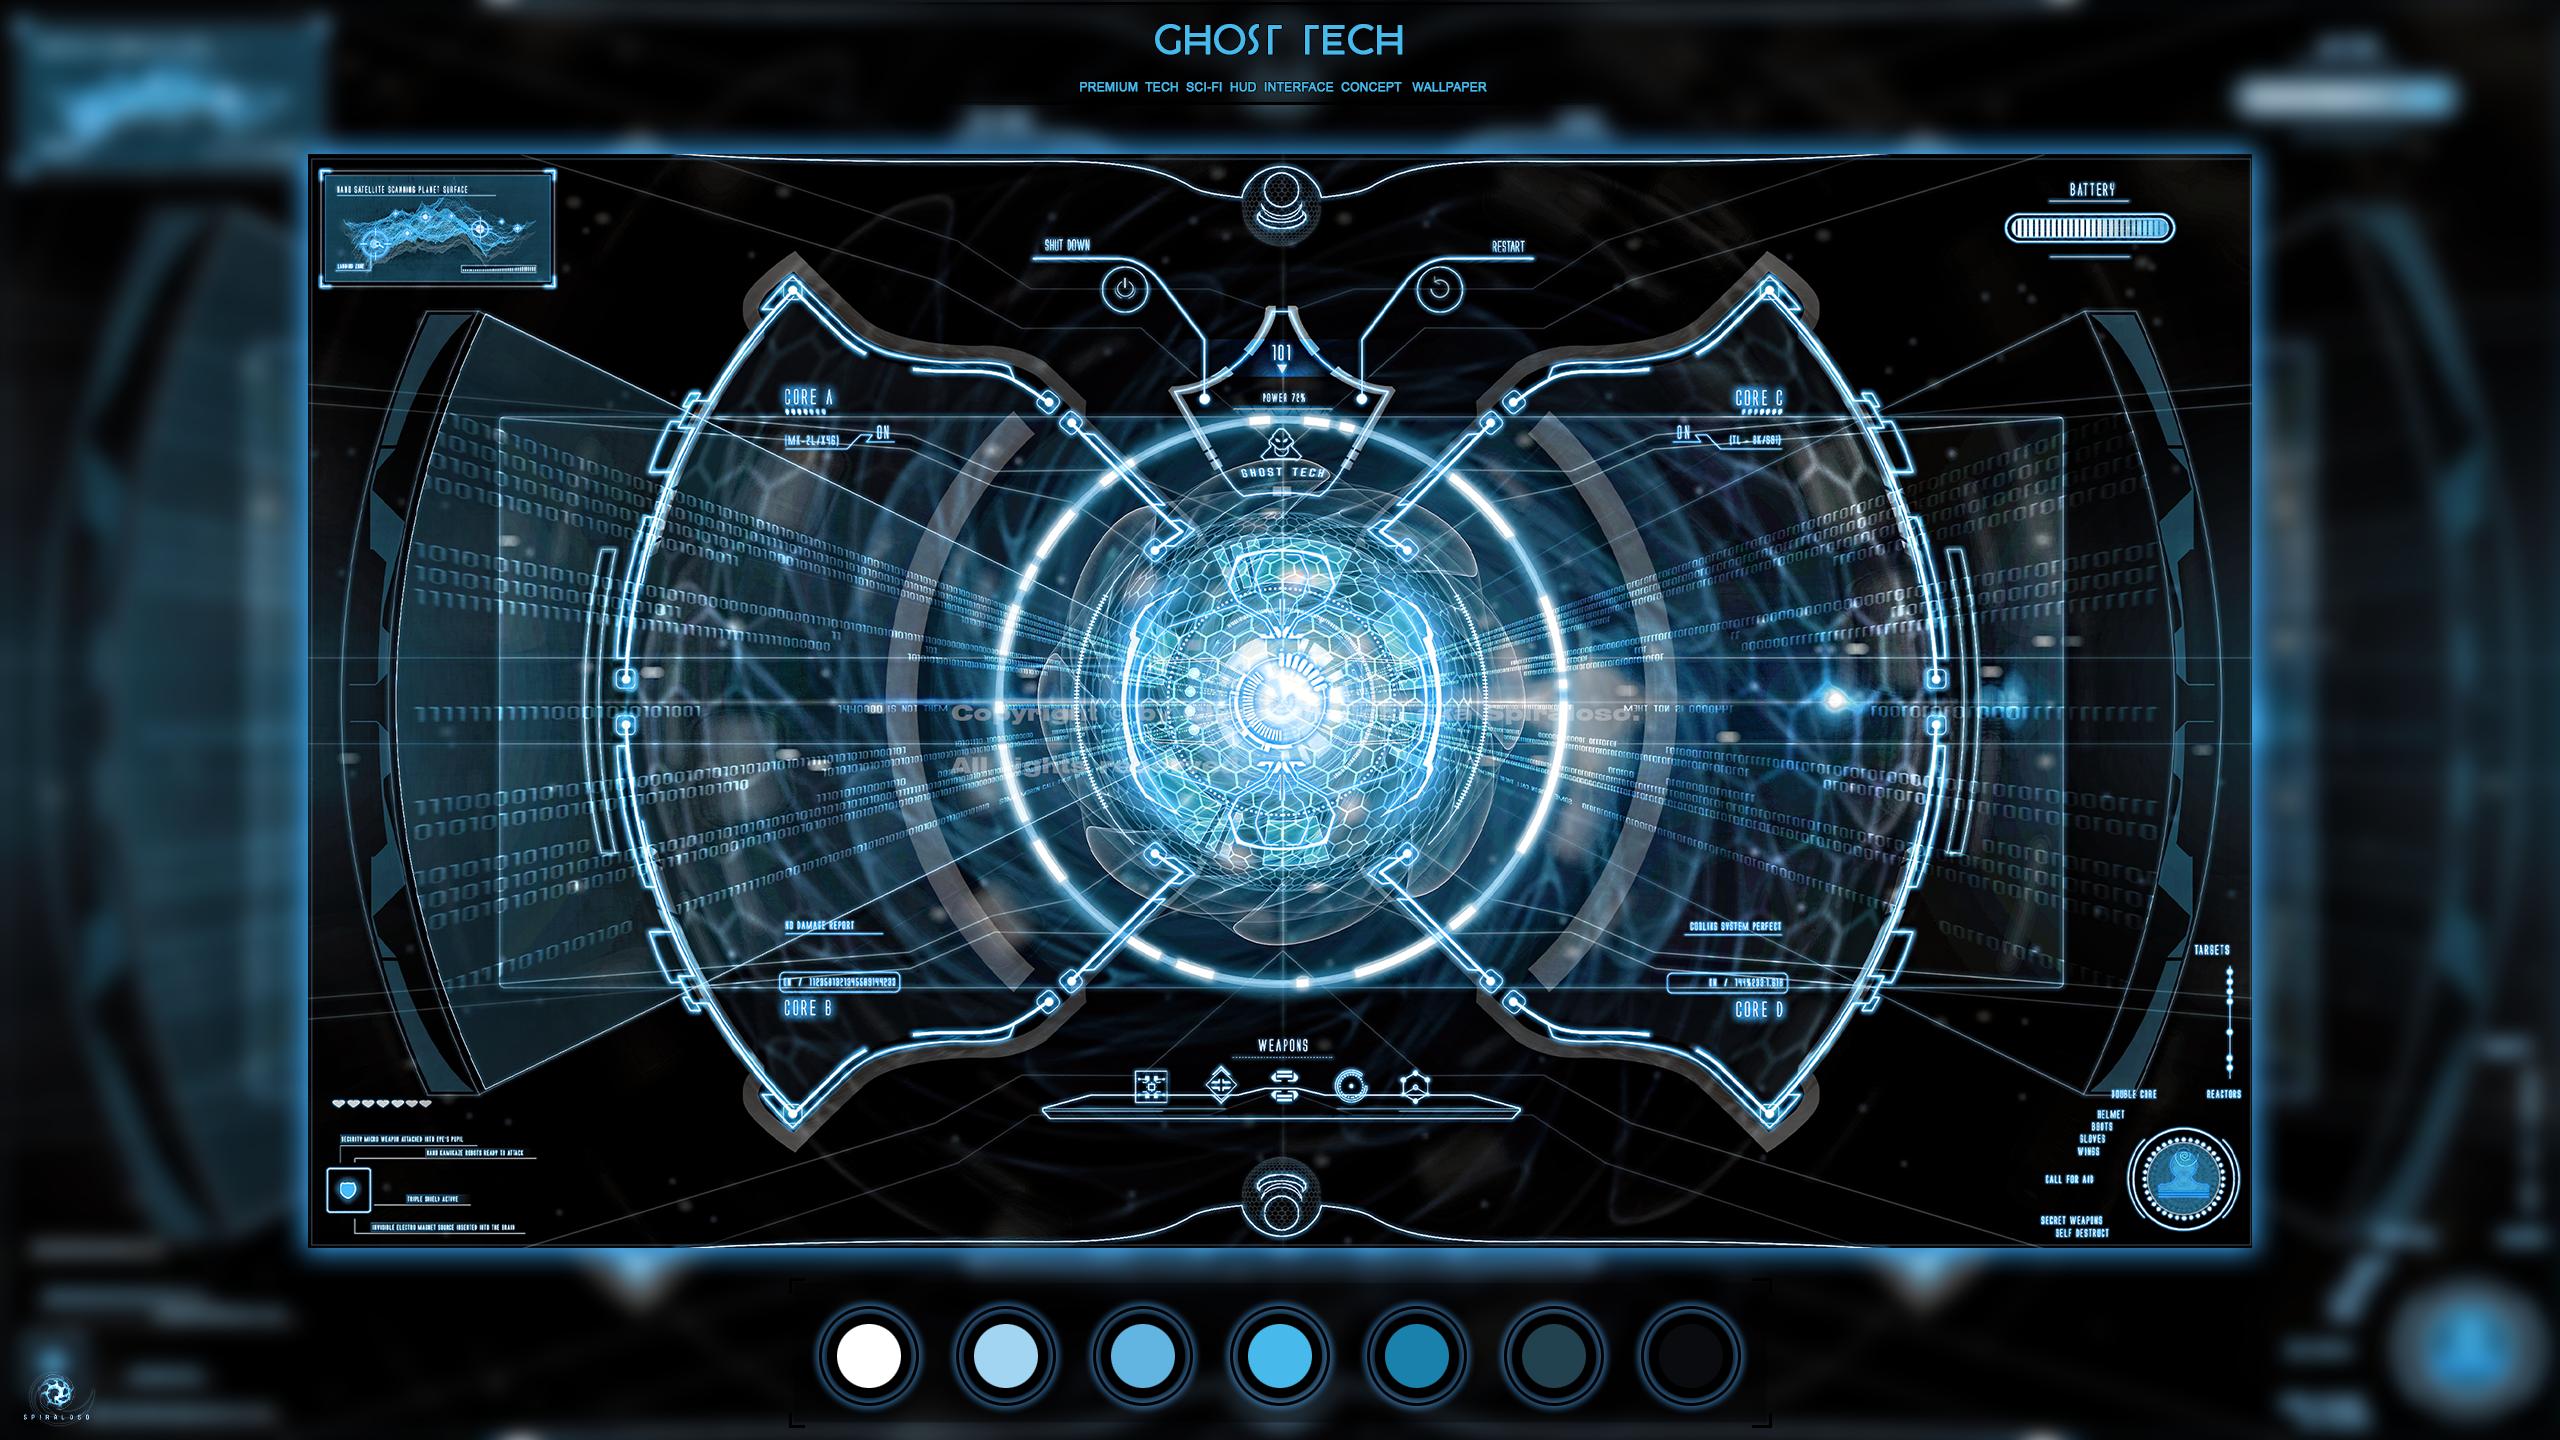 Wallpaper Interfaces Hud Science Fiction Tech 2560x1440 Tastyykilla 1840661 Hd Wallpapers Wallhere